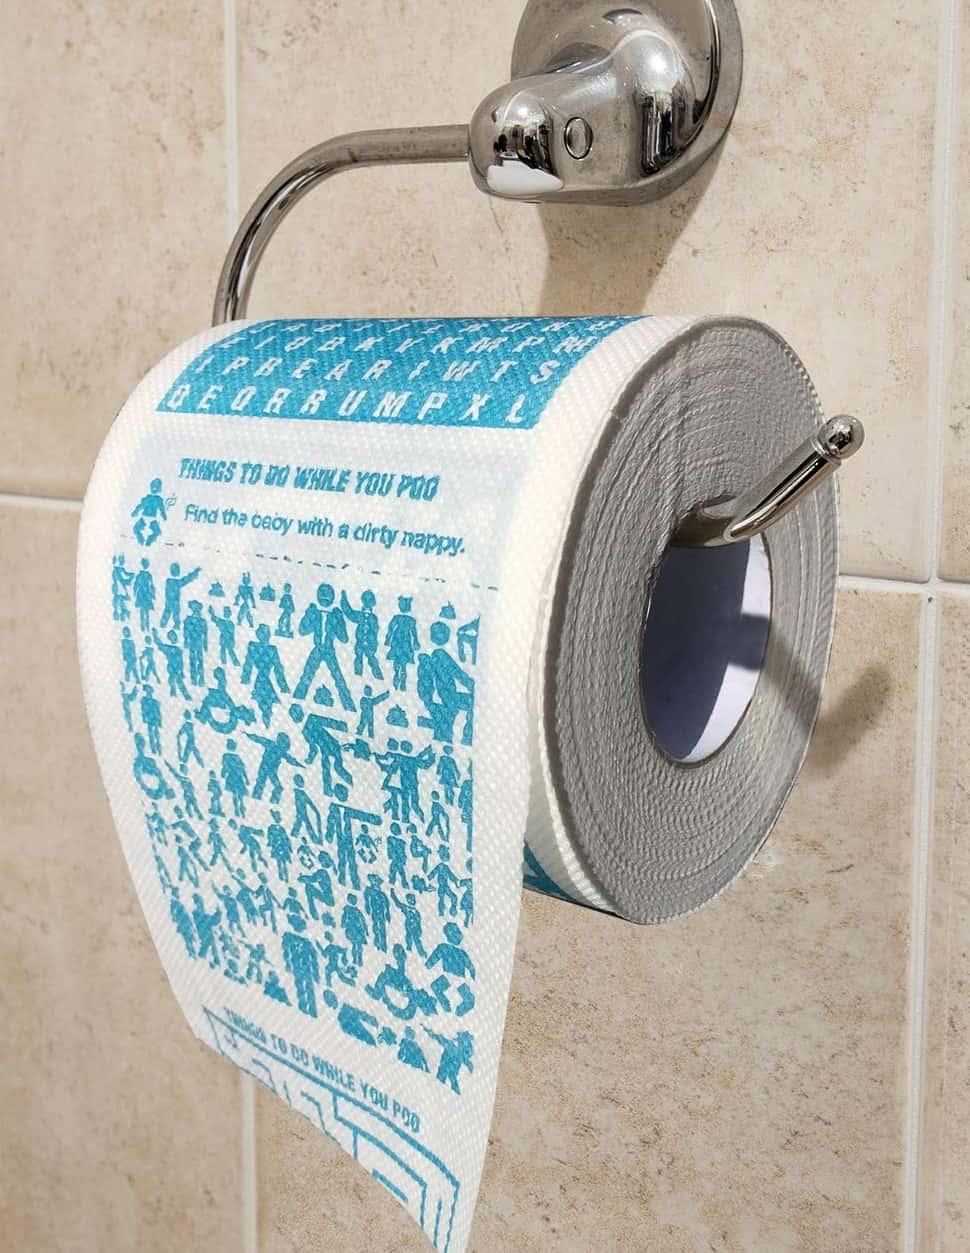 Creative Bathroom Toilet Games To Kill Your Bathroom Boredom